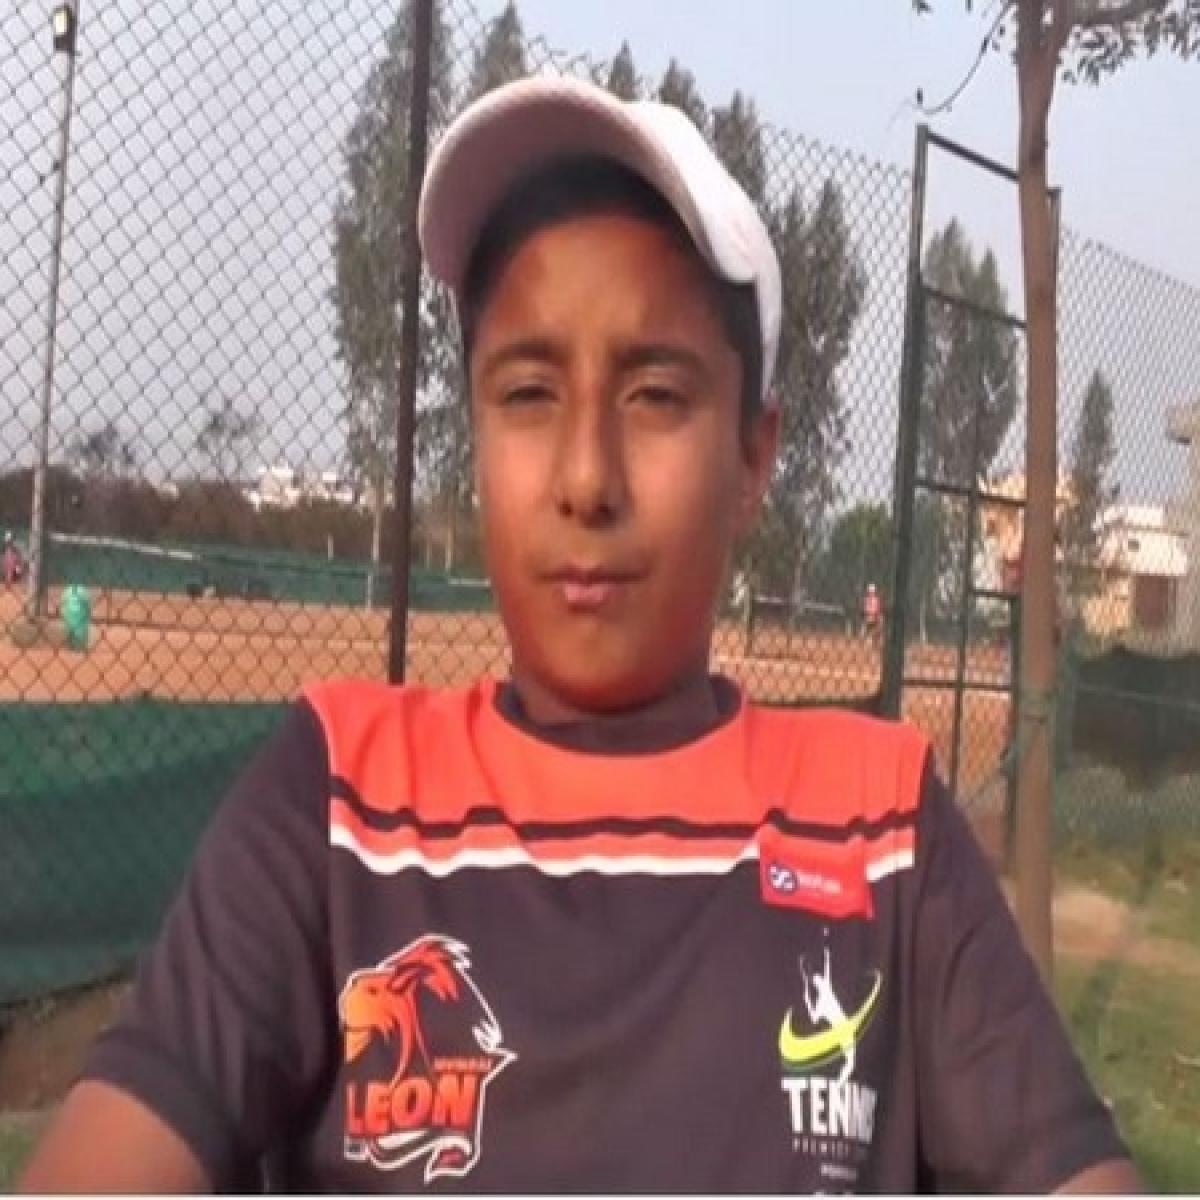 13-year-old Vansh Nandal selected for World Junior Tennis Championships